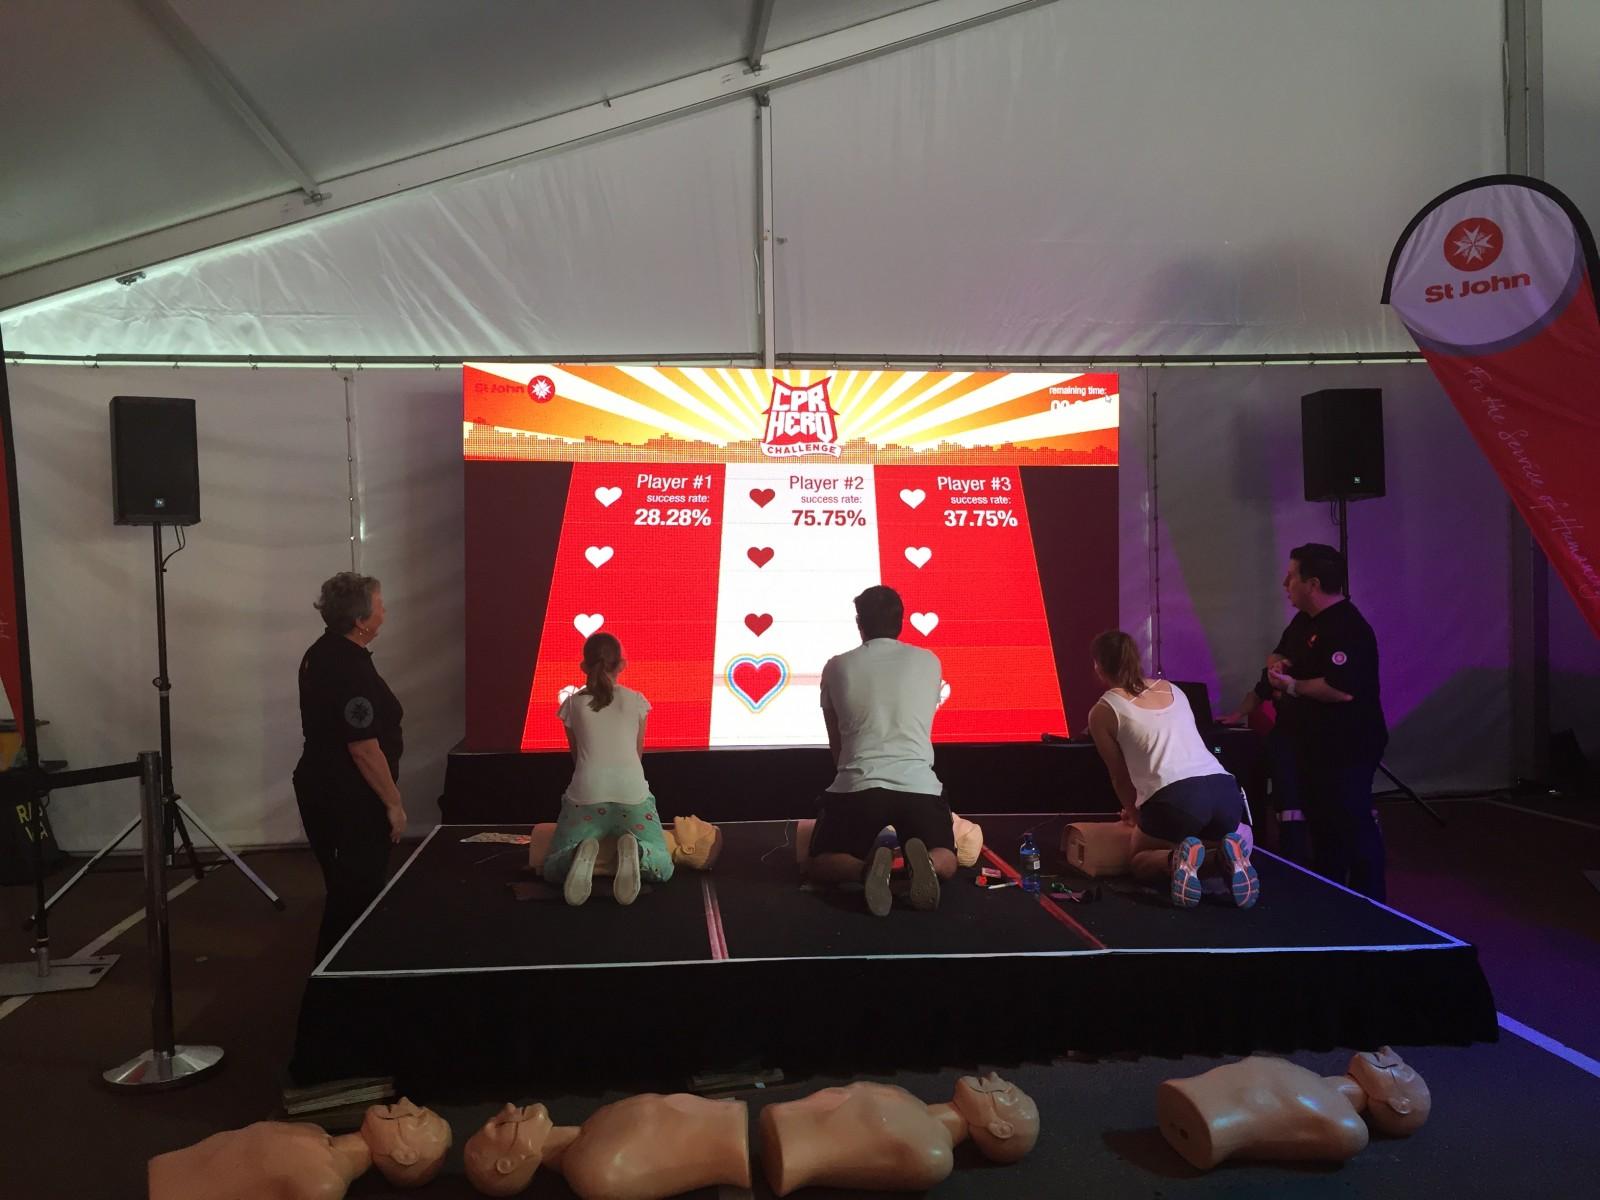 Be A Cpr Hero At The 2015 Perth Royal Show